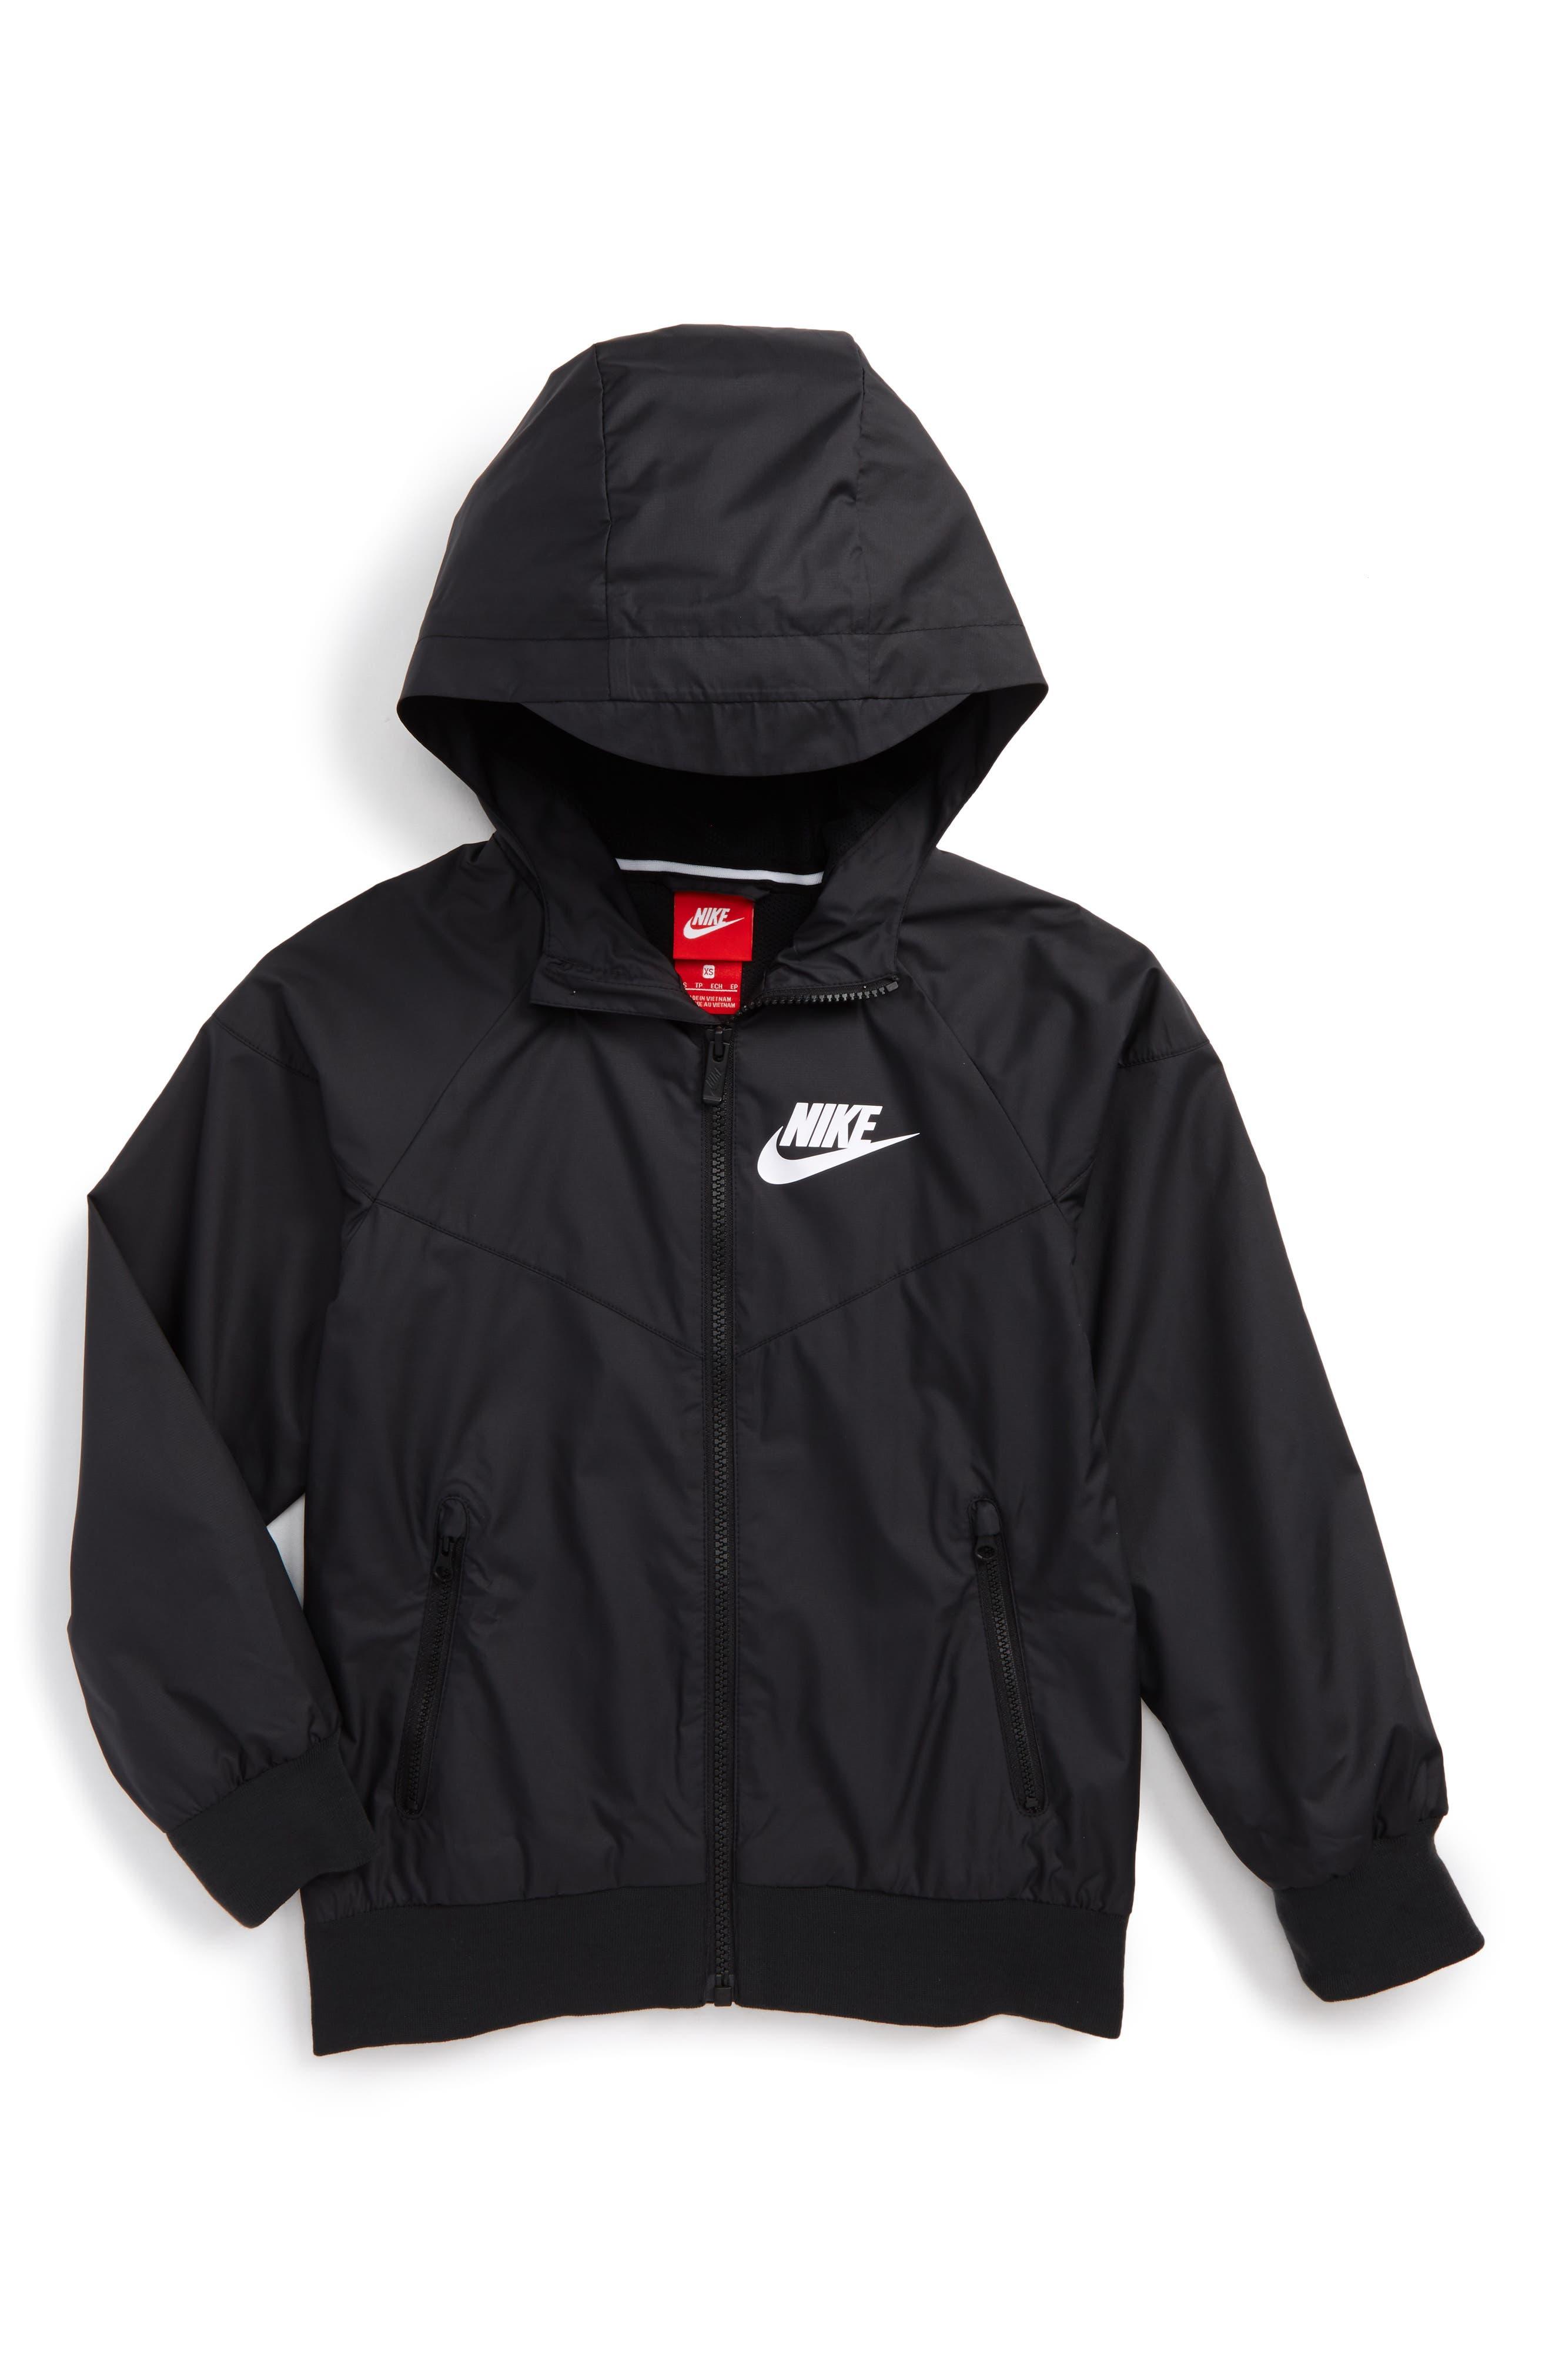 Windrunner Water Resistant Hooded Jacket,                             Main thumbnail 1, color,                             Black/ White